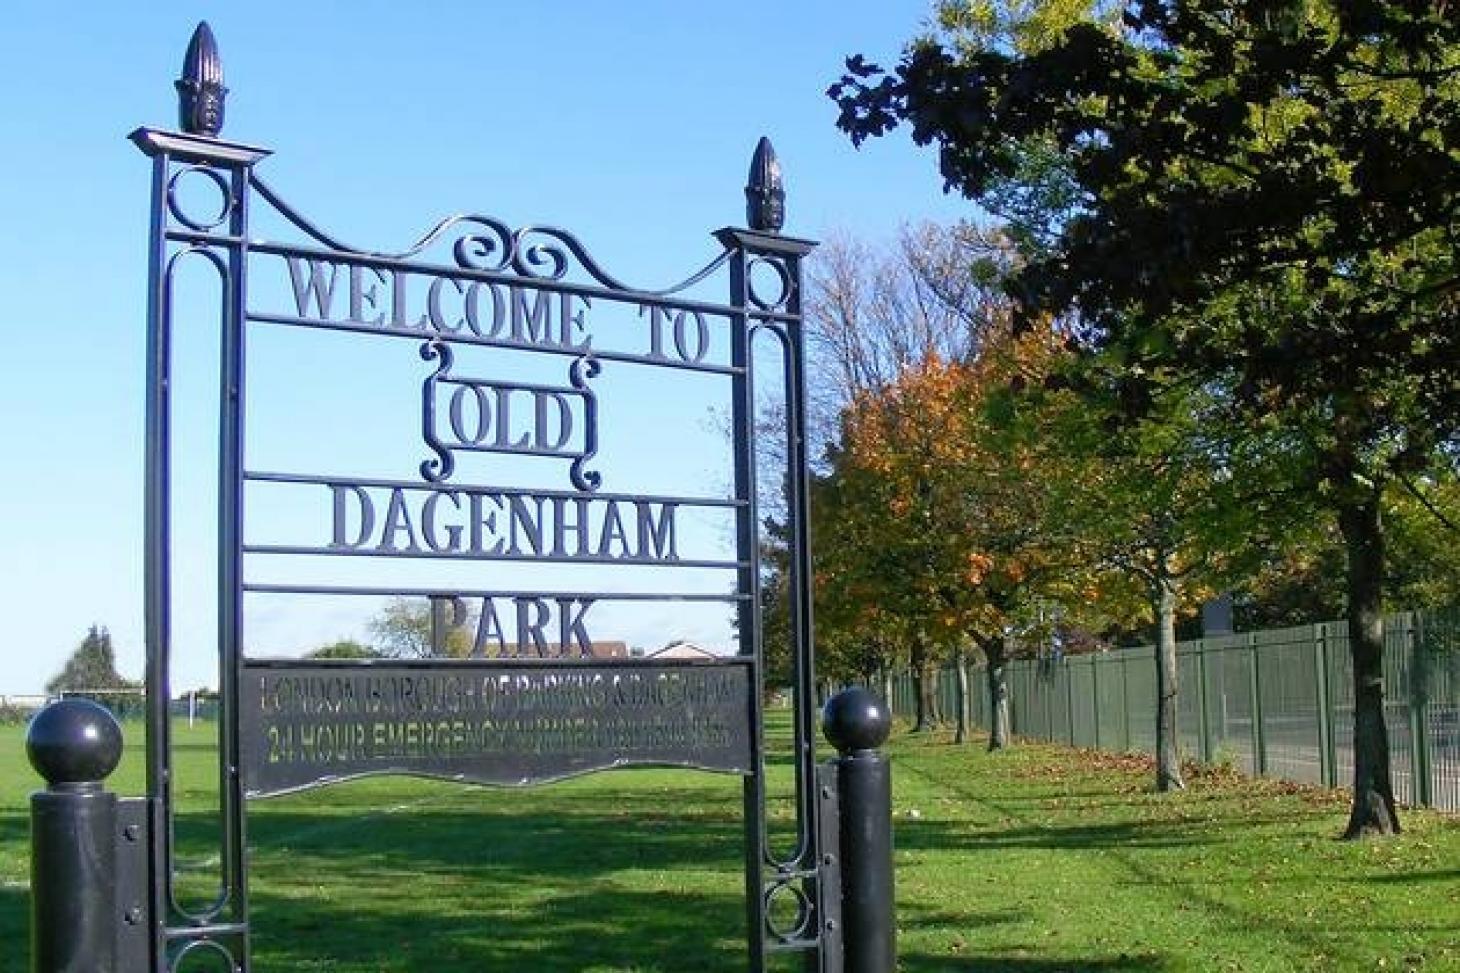 Old Dagenham Park 5 a side | Concrete football pitch